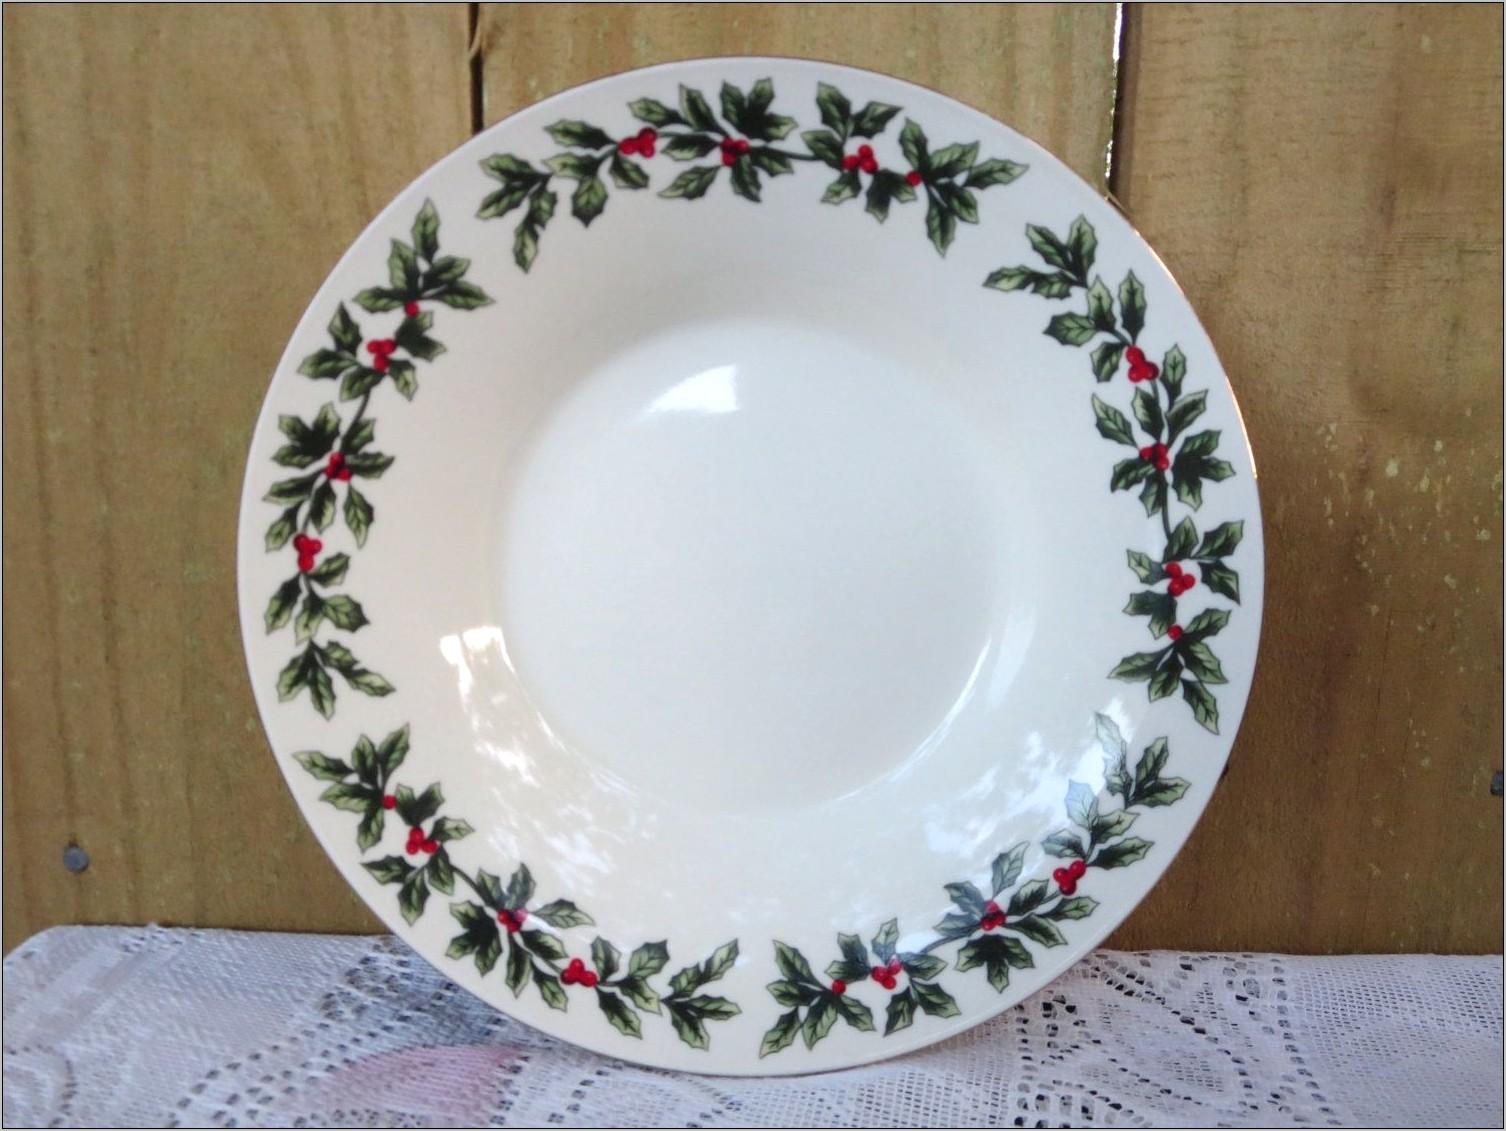 Formalities Decorative Salad Plate Rustic Kitchen